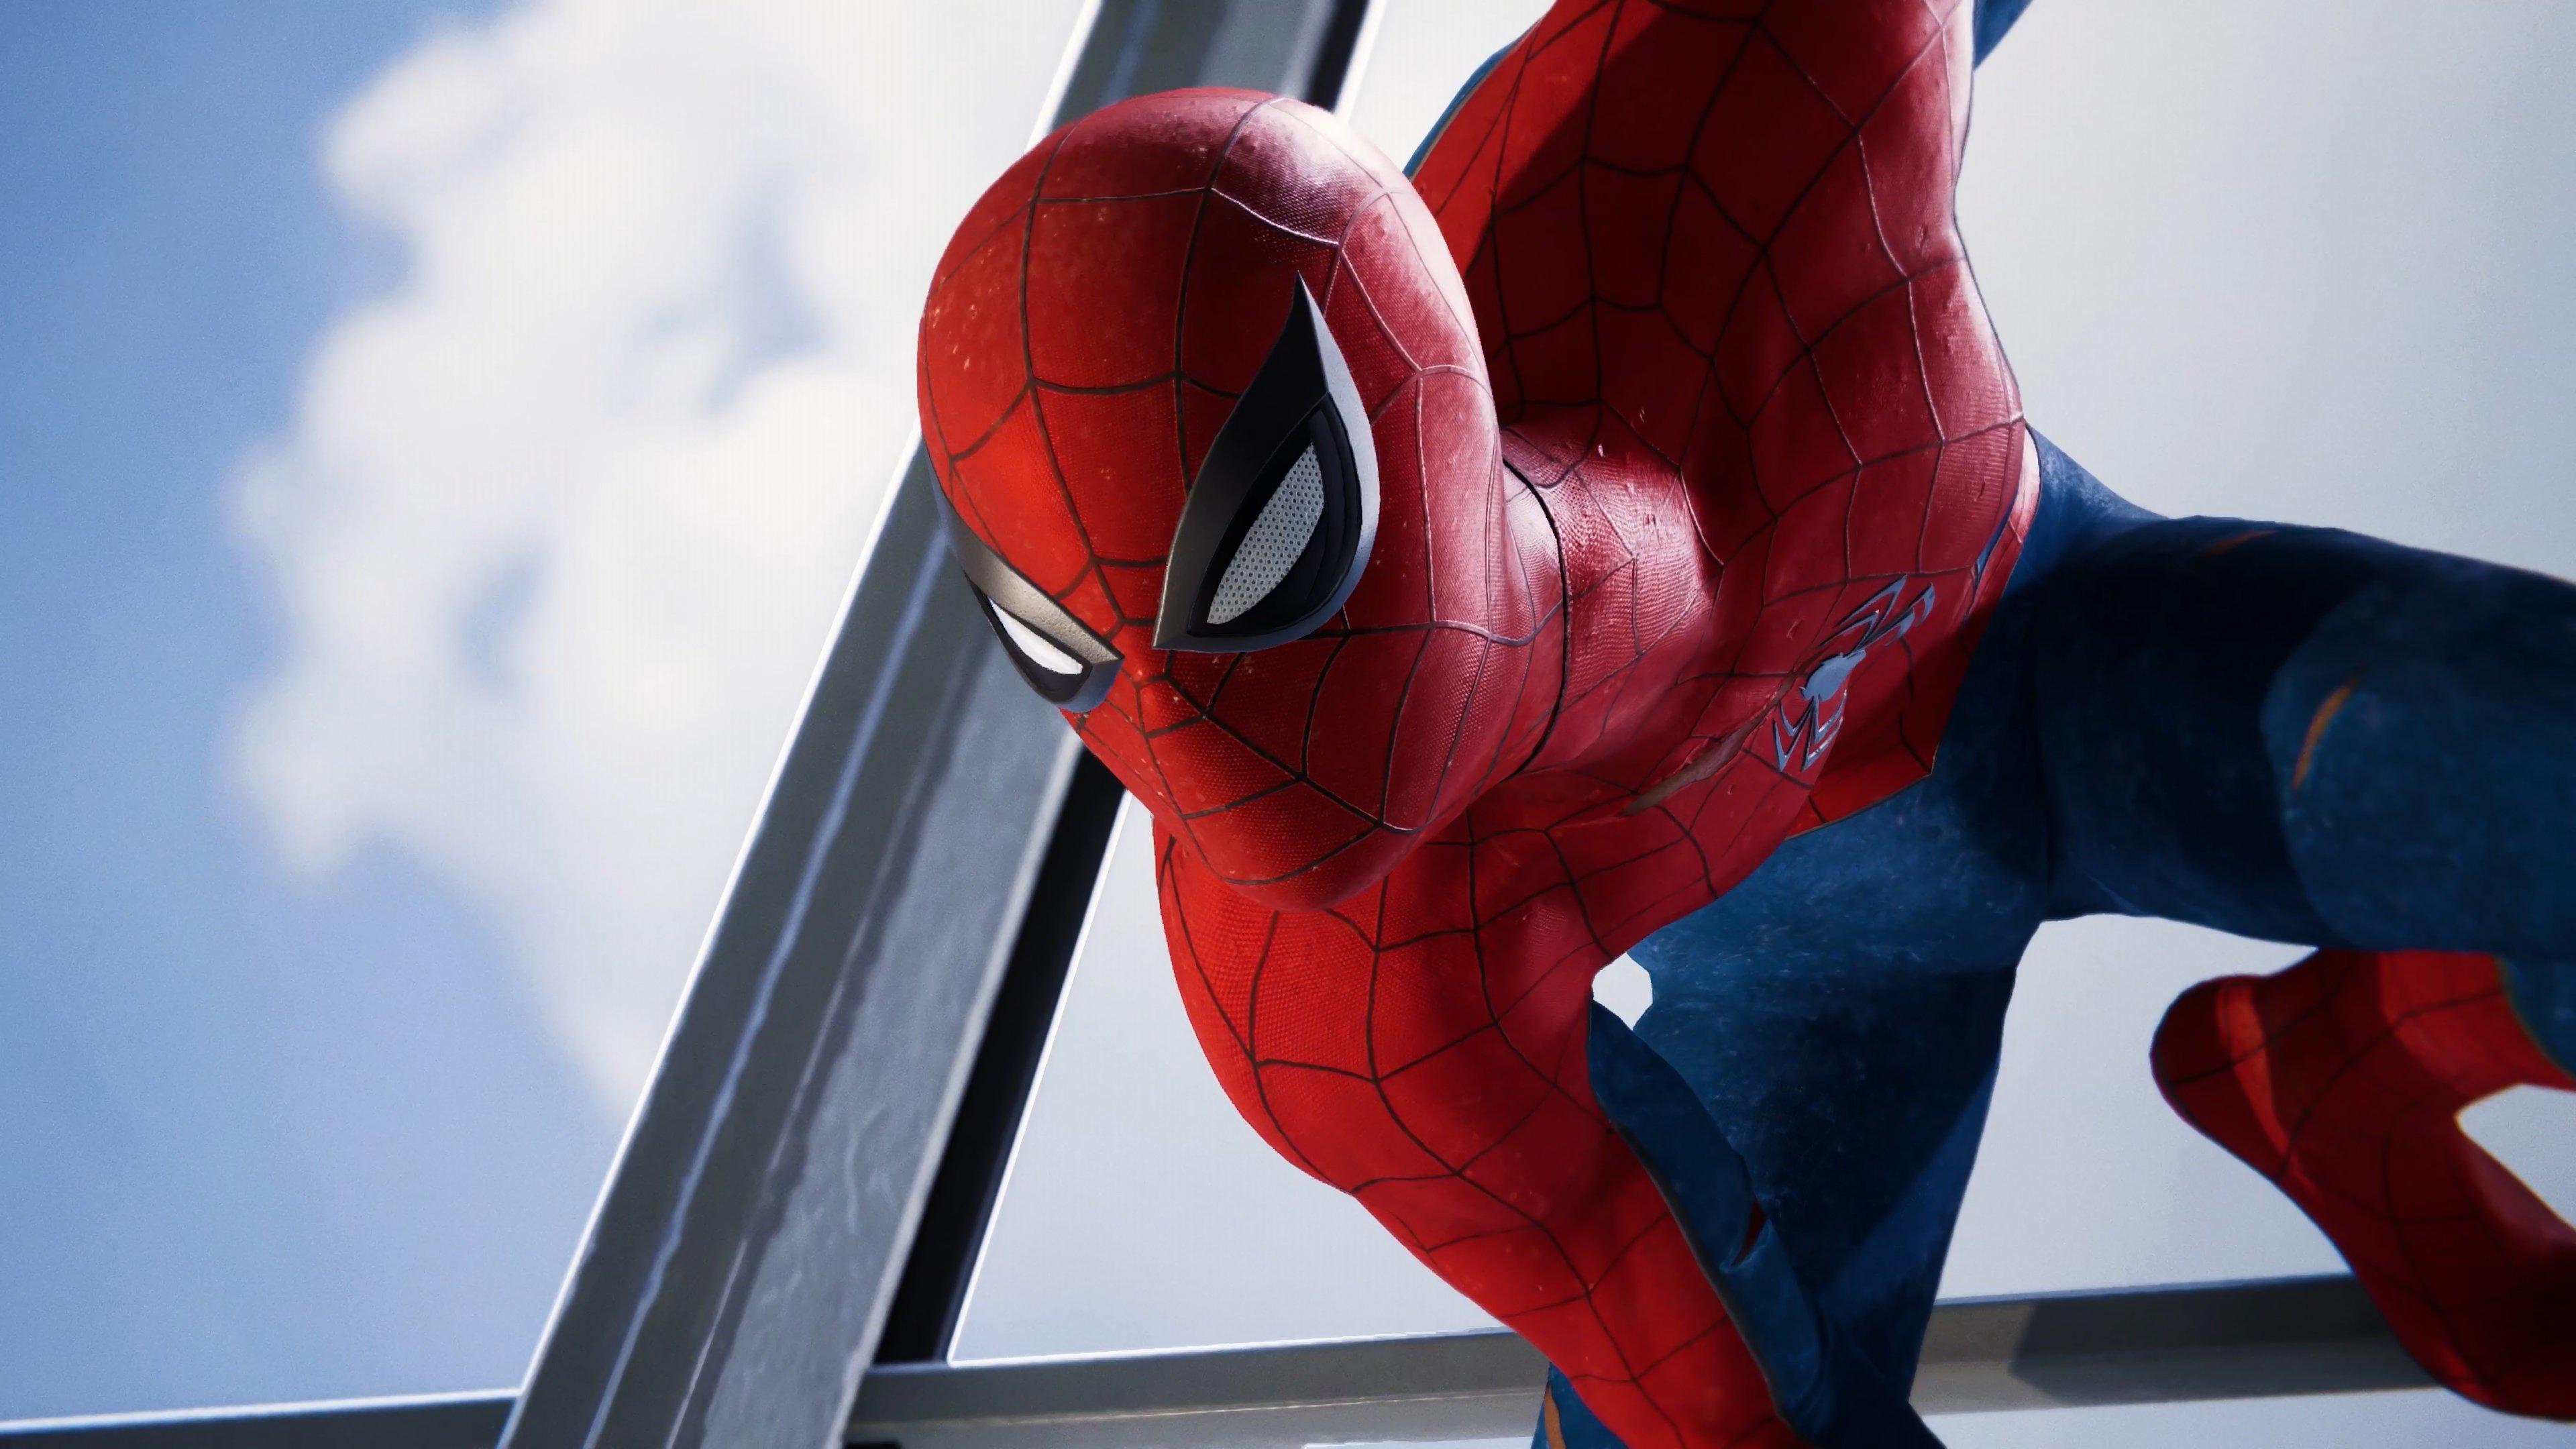 Fondos de pantalla Spider-Man PS4 observando